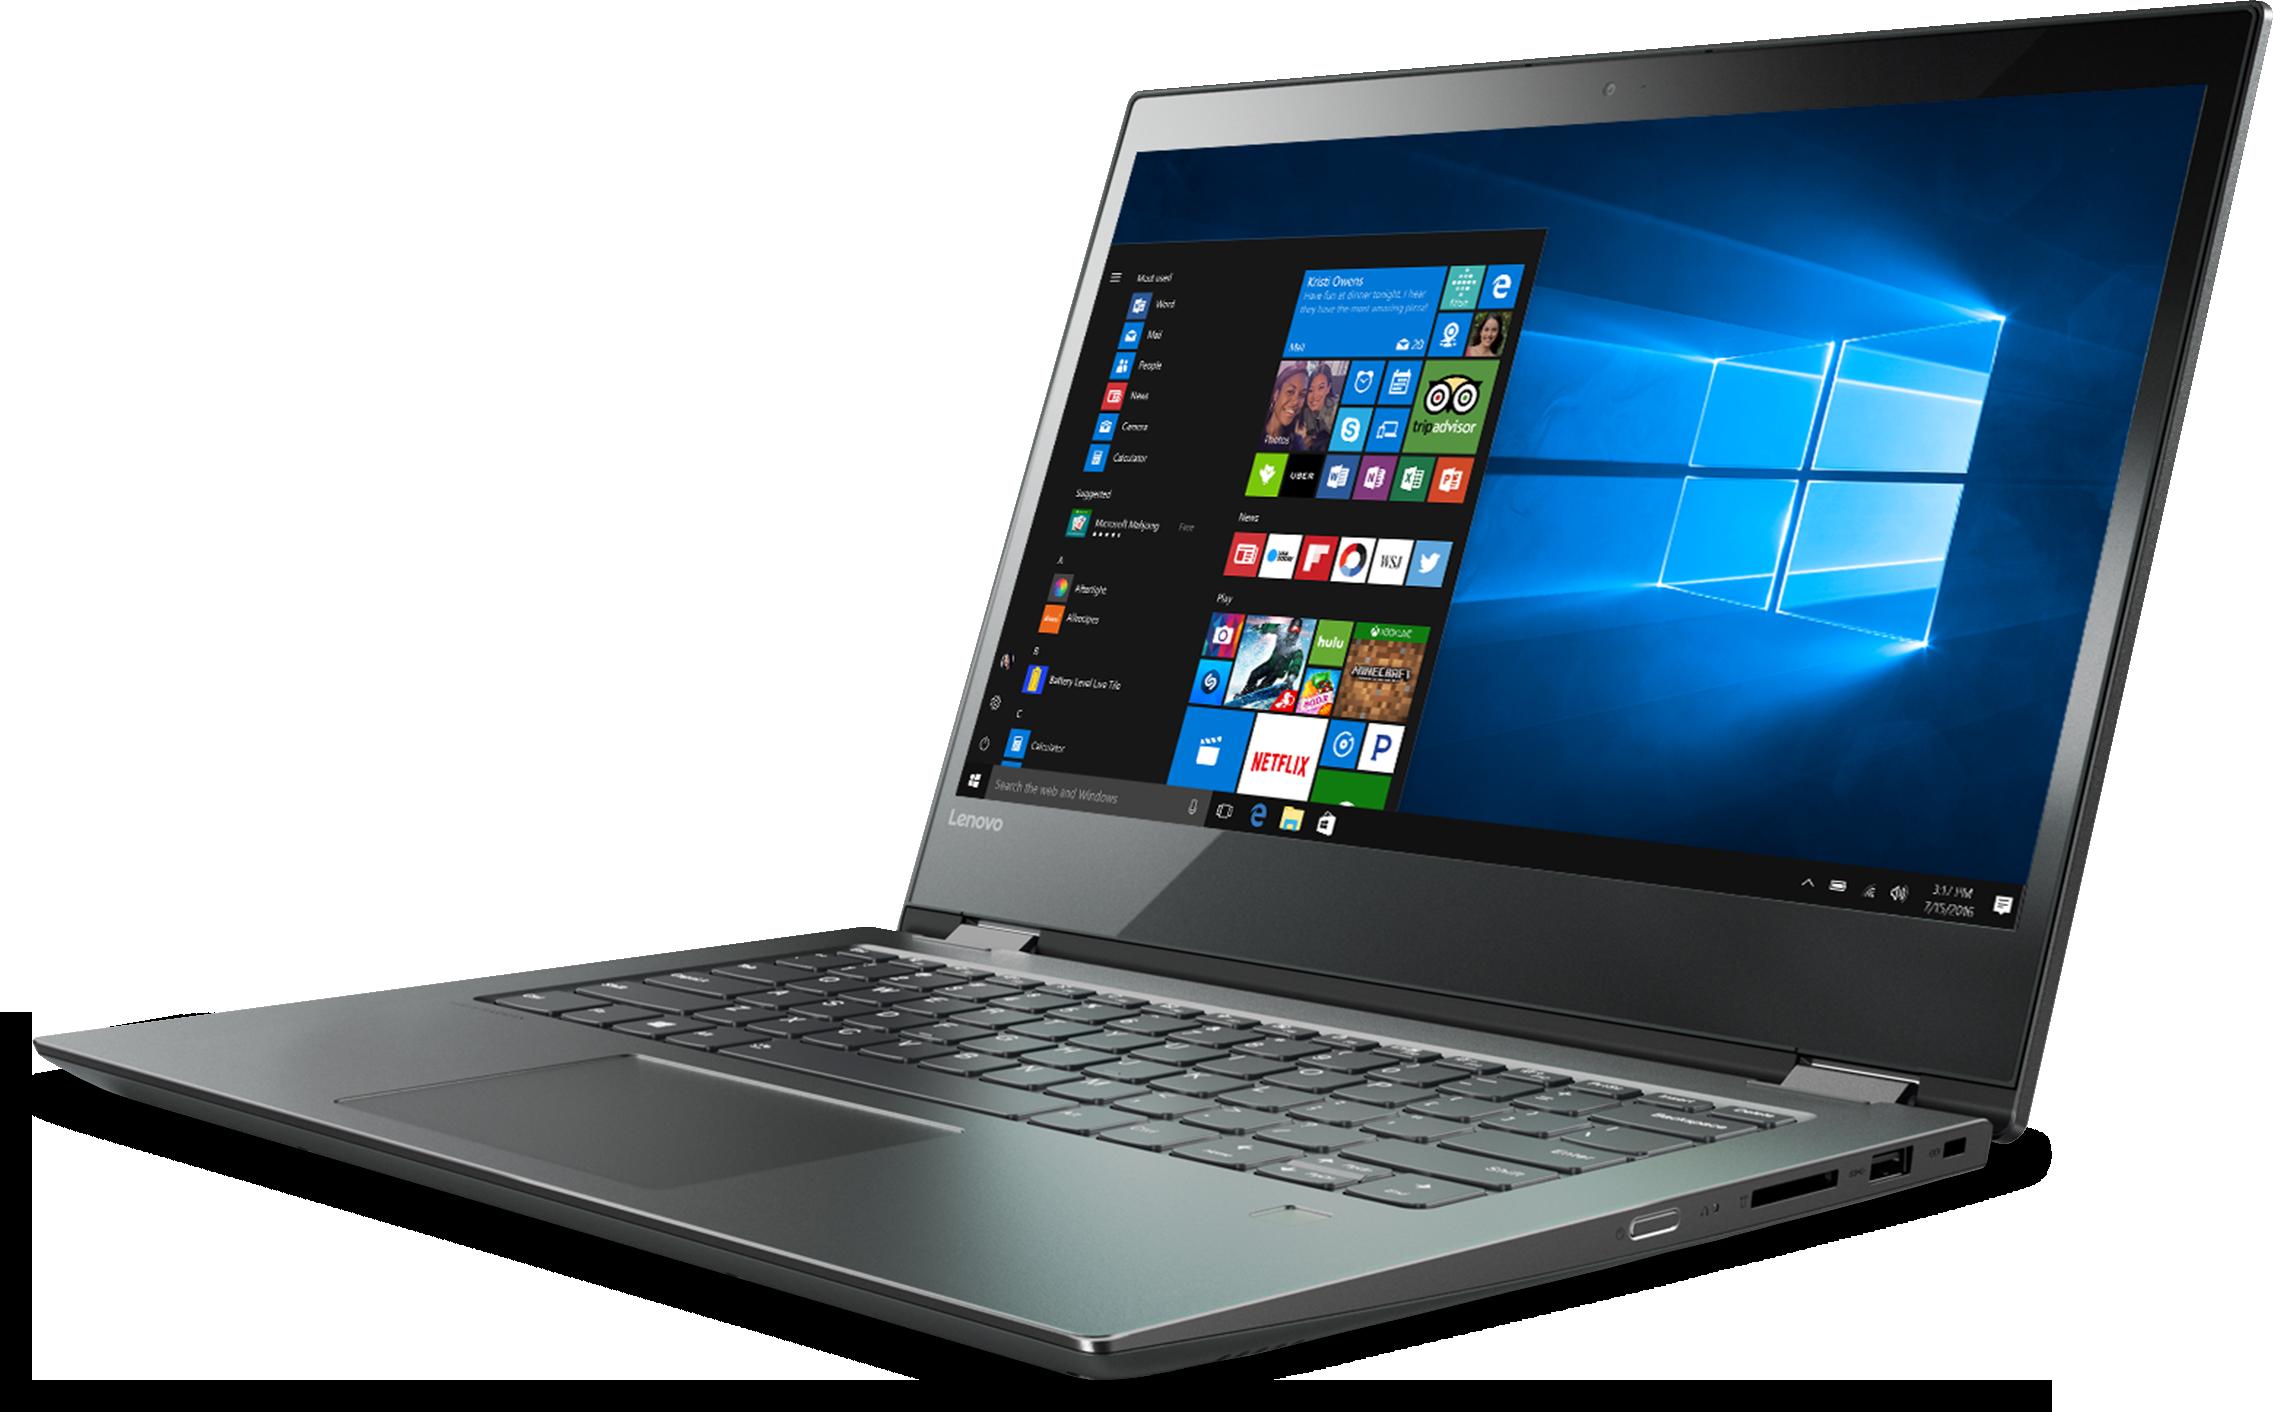 Lenovo Ideapad Flex 5 14 80XA0007US 2 in 1